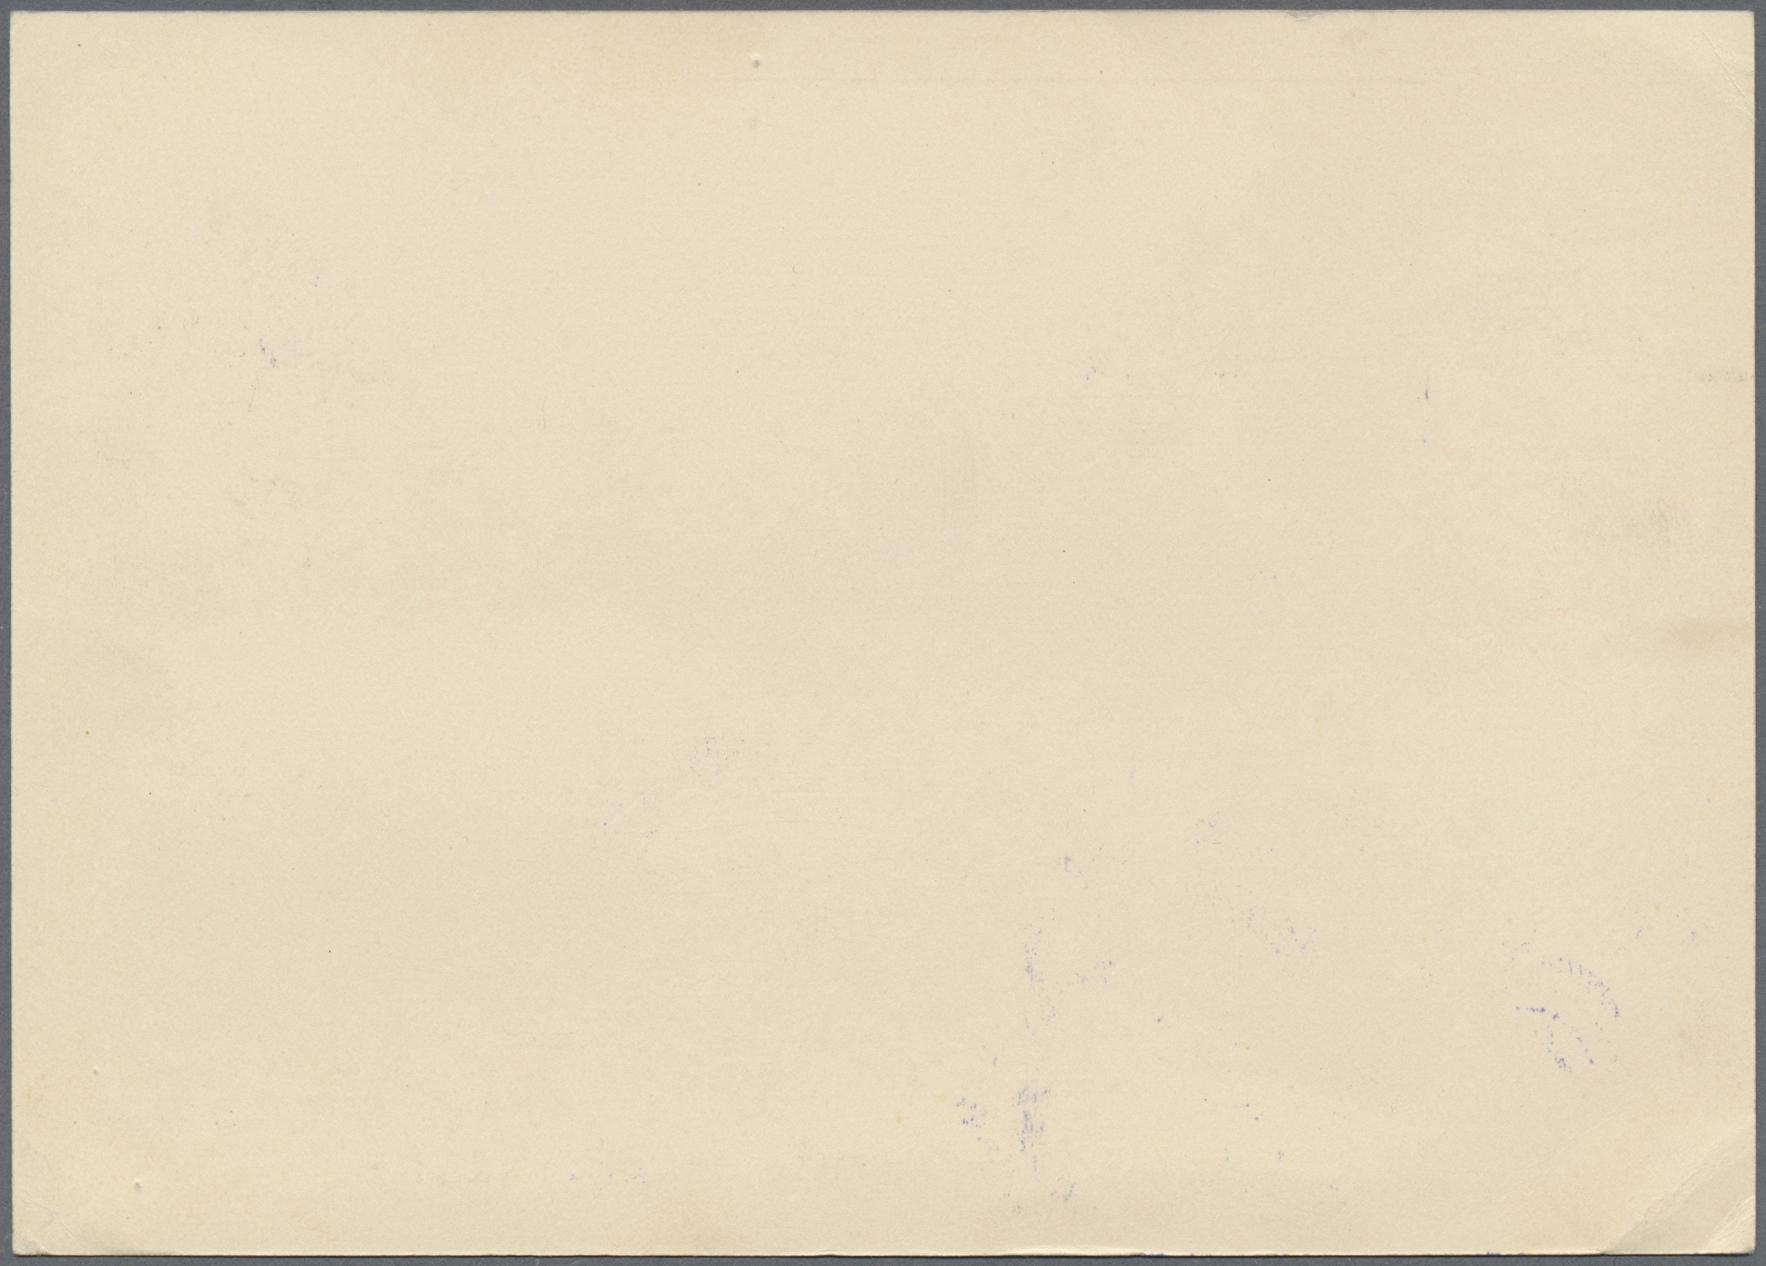 Lot 21625 - Deutsches Reich - Markenheftchenblätter  -  Auktionshaus Christoph Gärtner GmbH & Co. KG Single lots Germany + Picture Postcards. Auction #39 Day 5